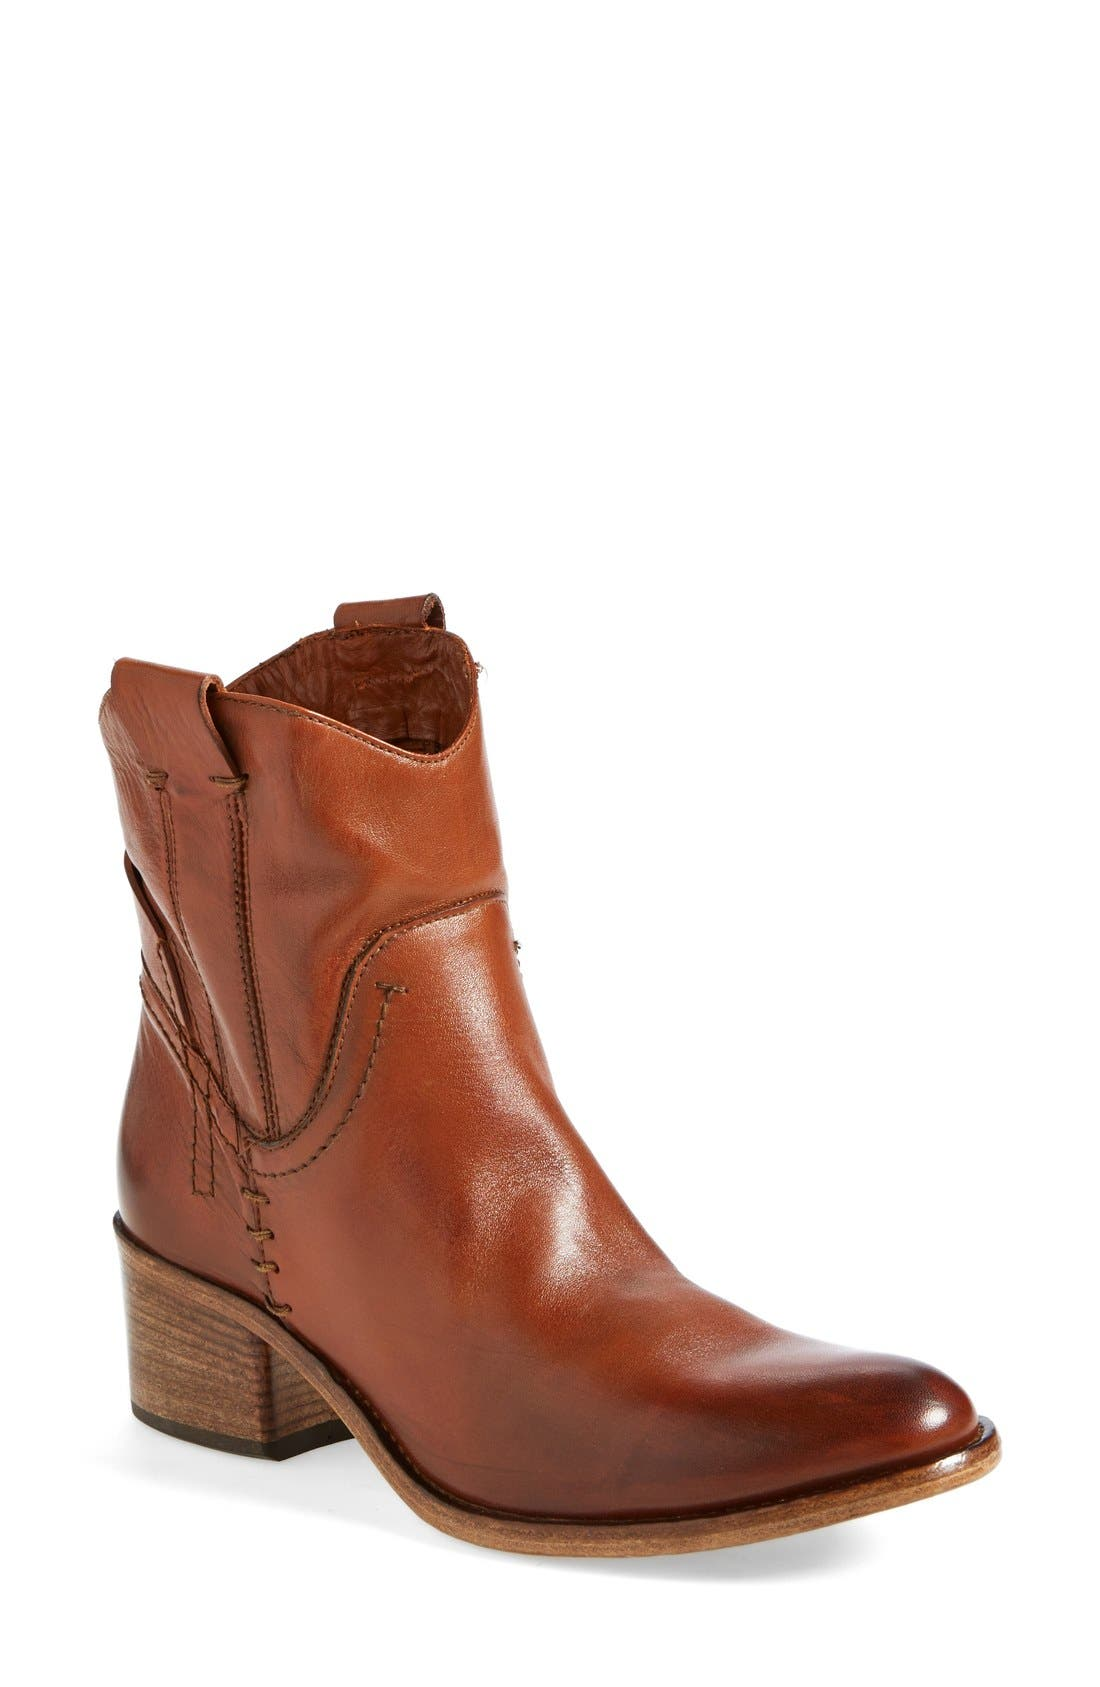 Alternate Image 1 Selected - Alberto Fermani 'Volo' Boot (Women)